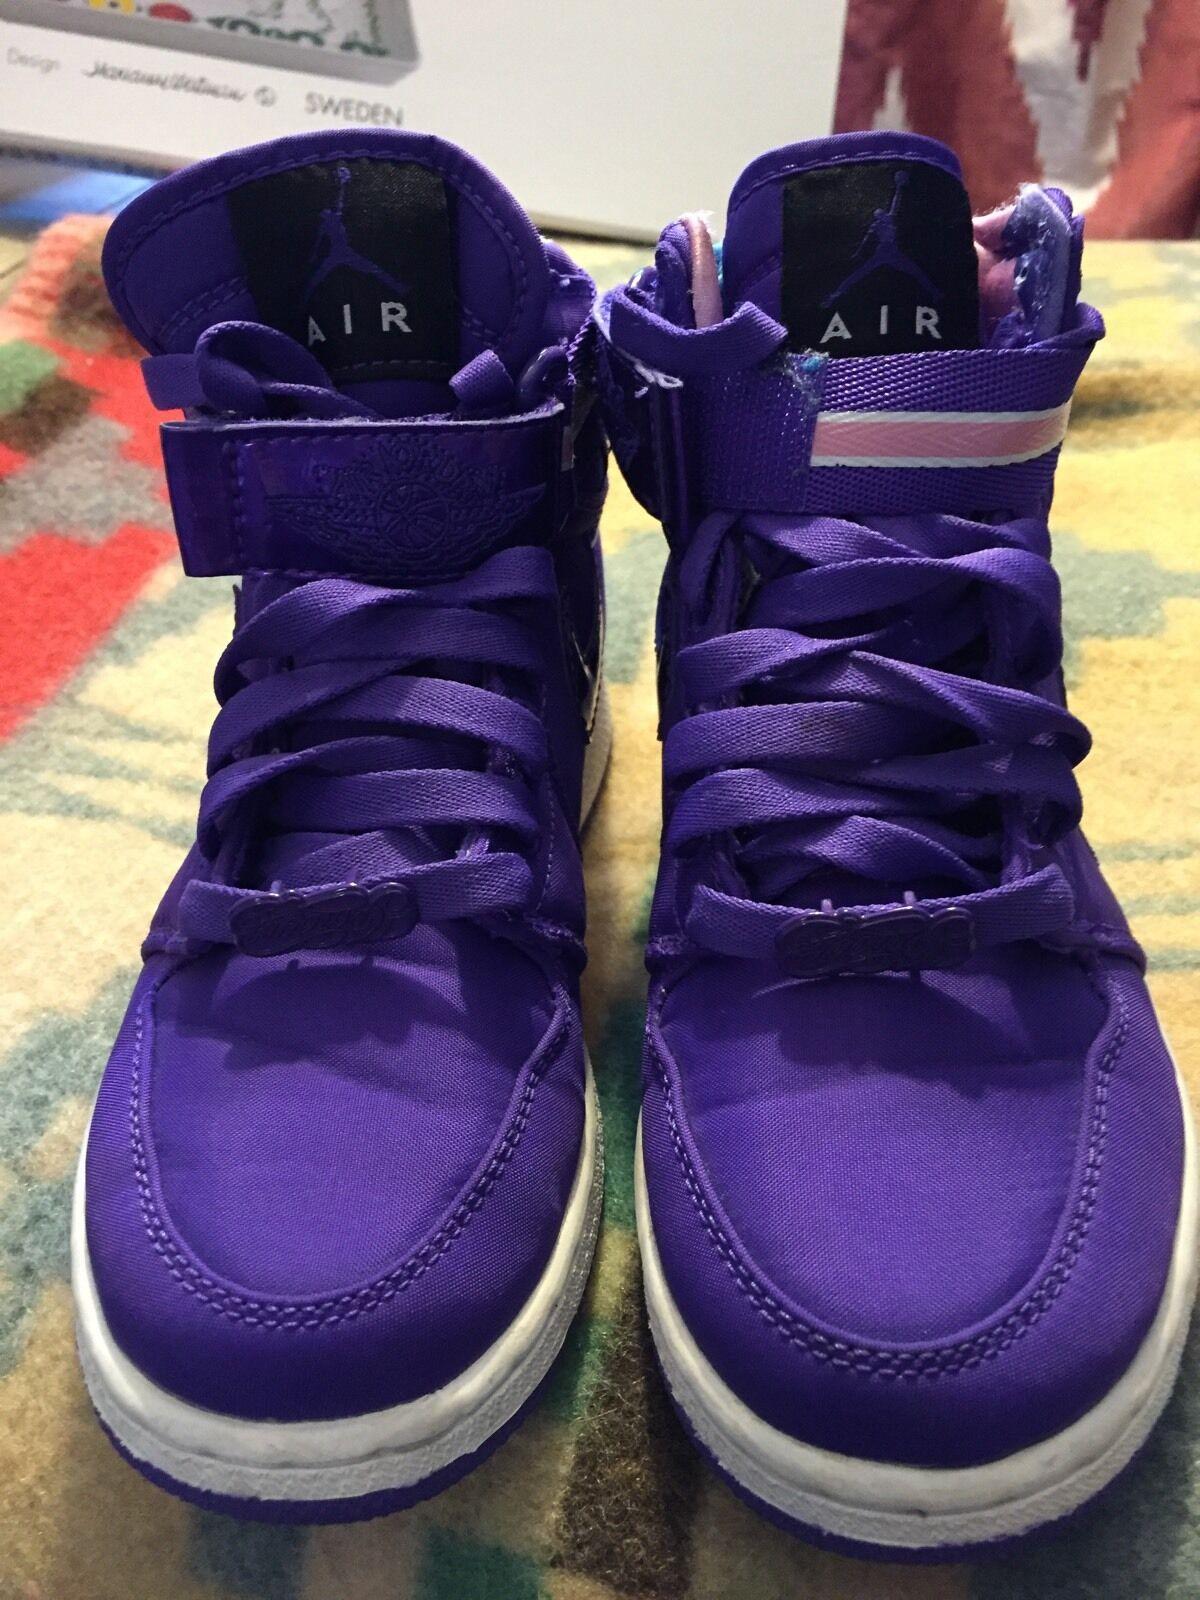 Air Jordan 1 High Women's - strap - Purple - White - Comfortable